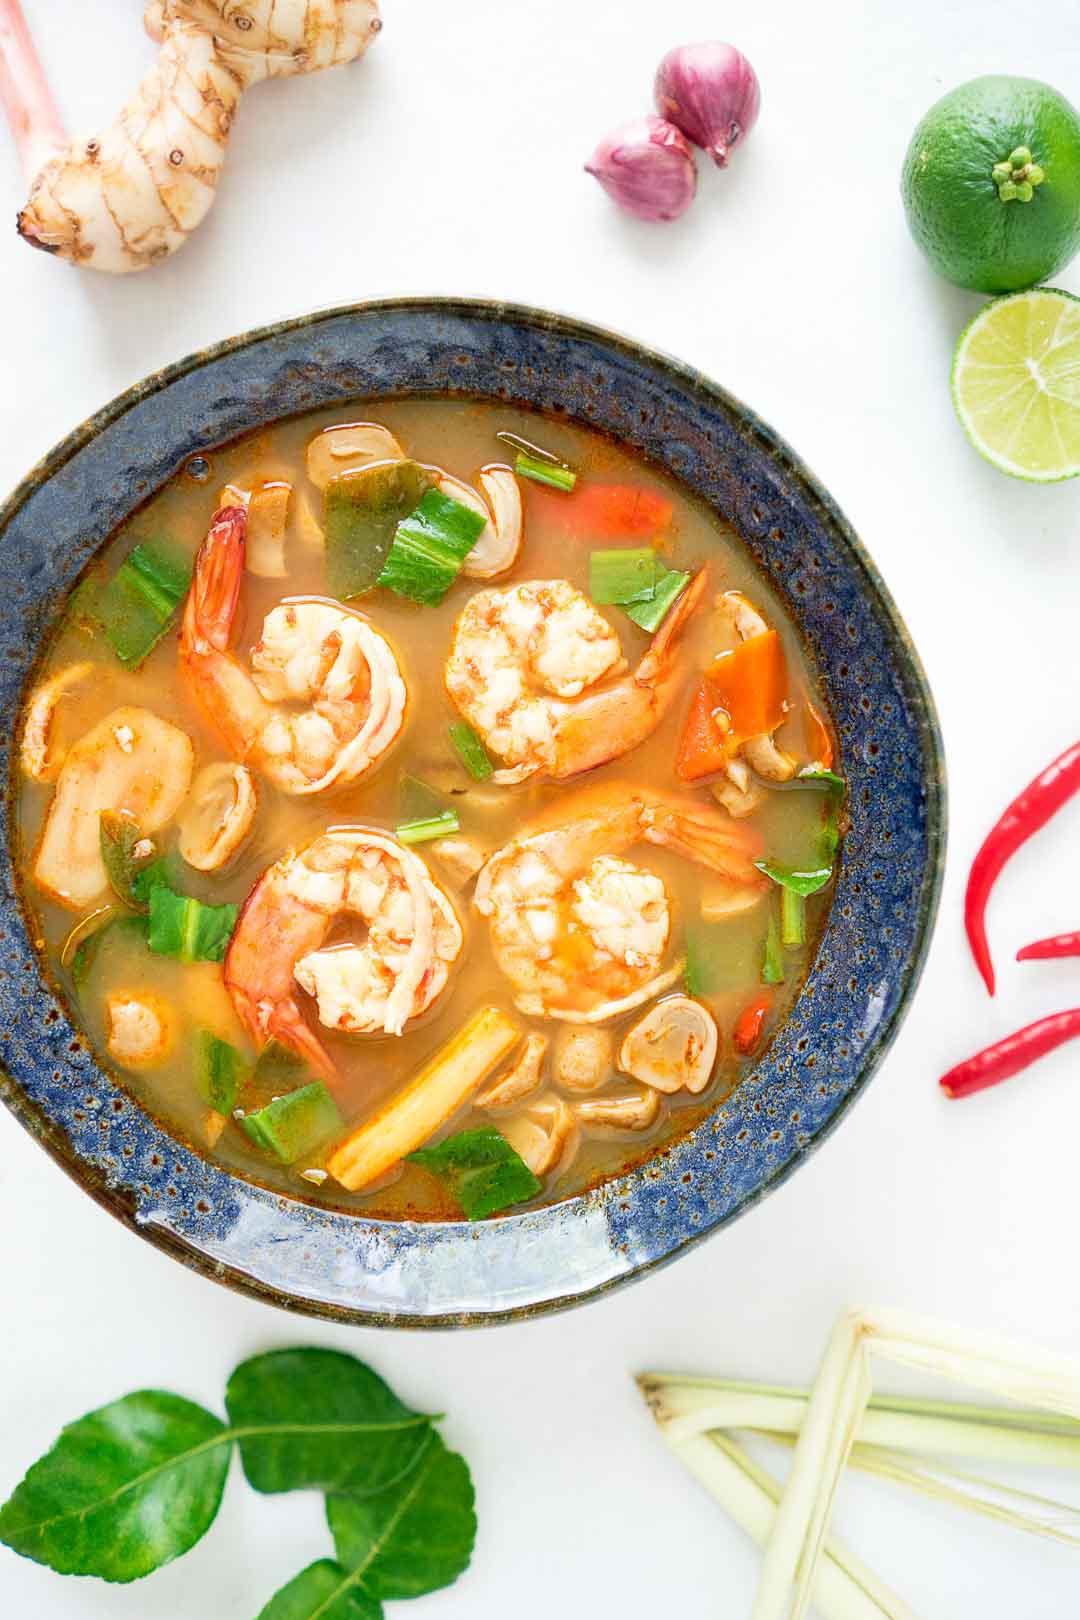 a bowl of tom yum goong or Thai lemongrass soup | tom yum gung | ต้มยำกุ้ง